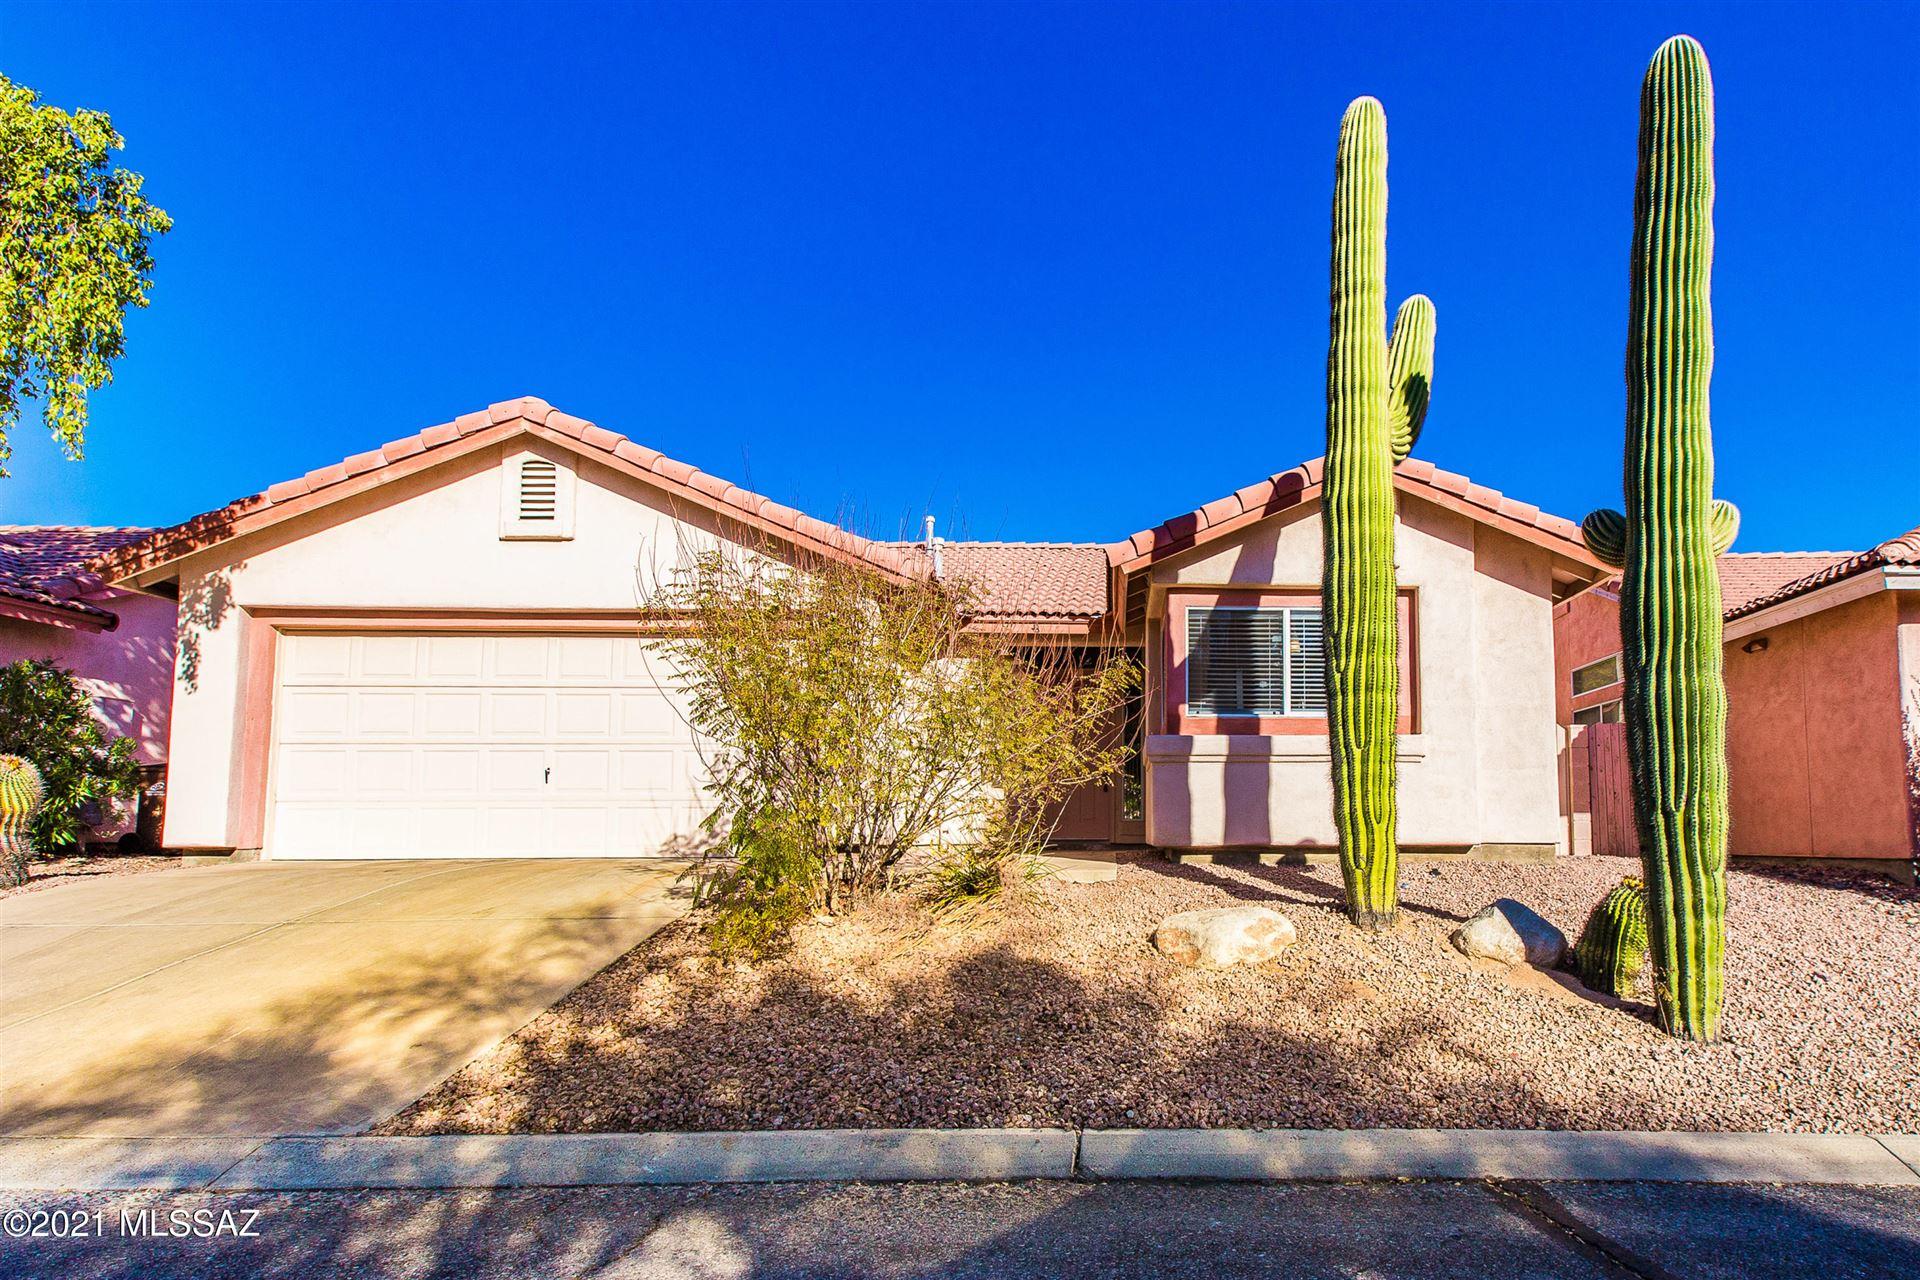 9970 N Stageline Trail, Tucson, AZ 85742 - #: 22106157